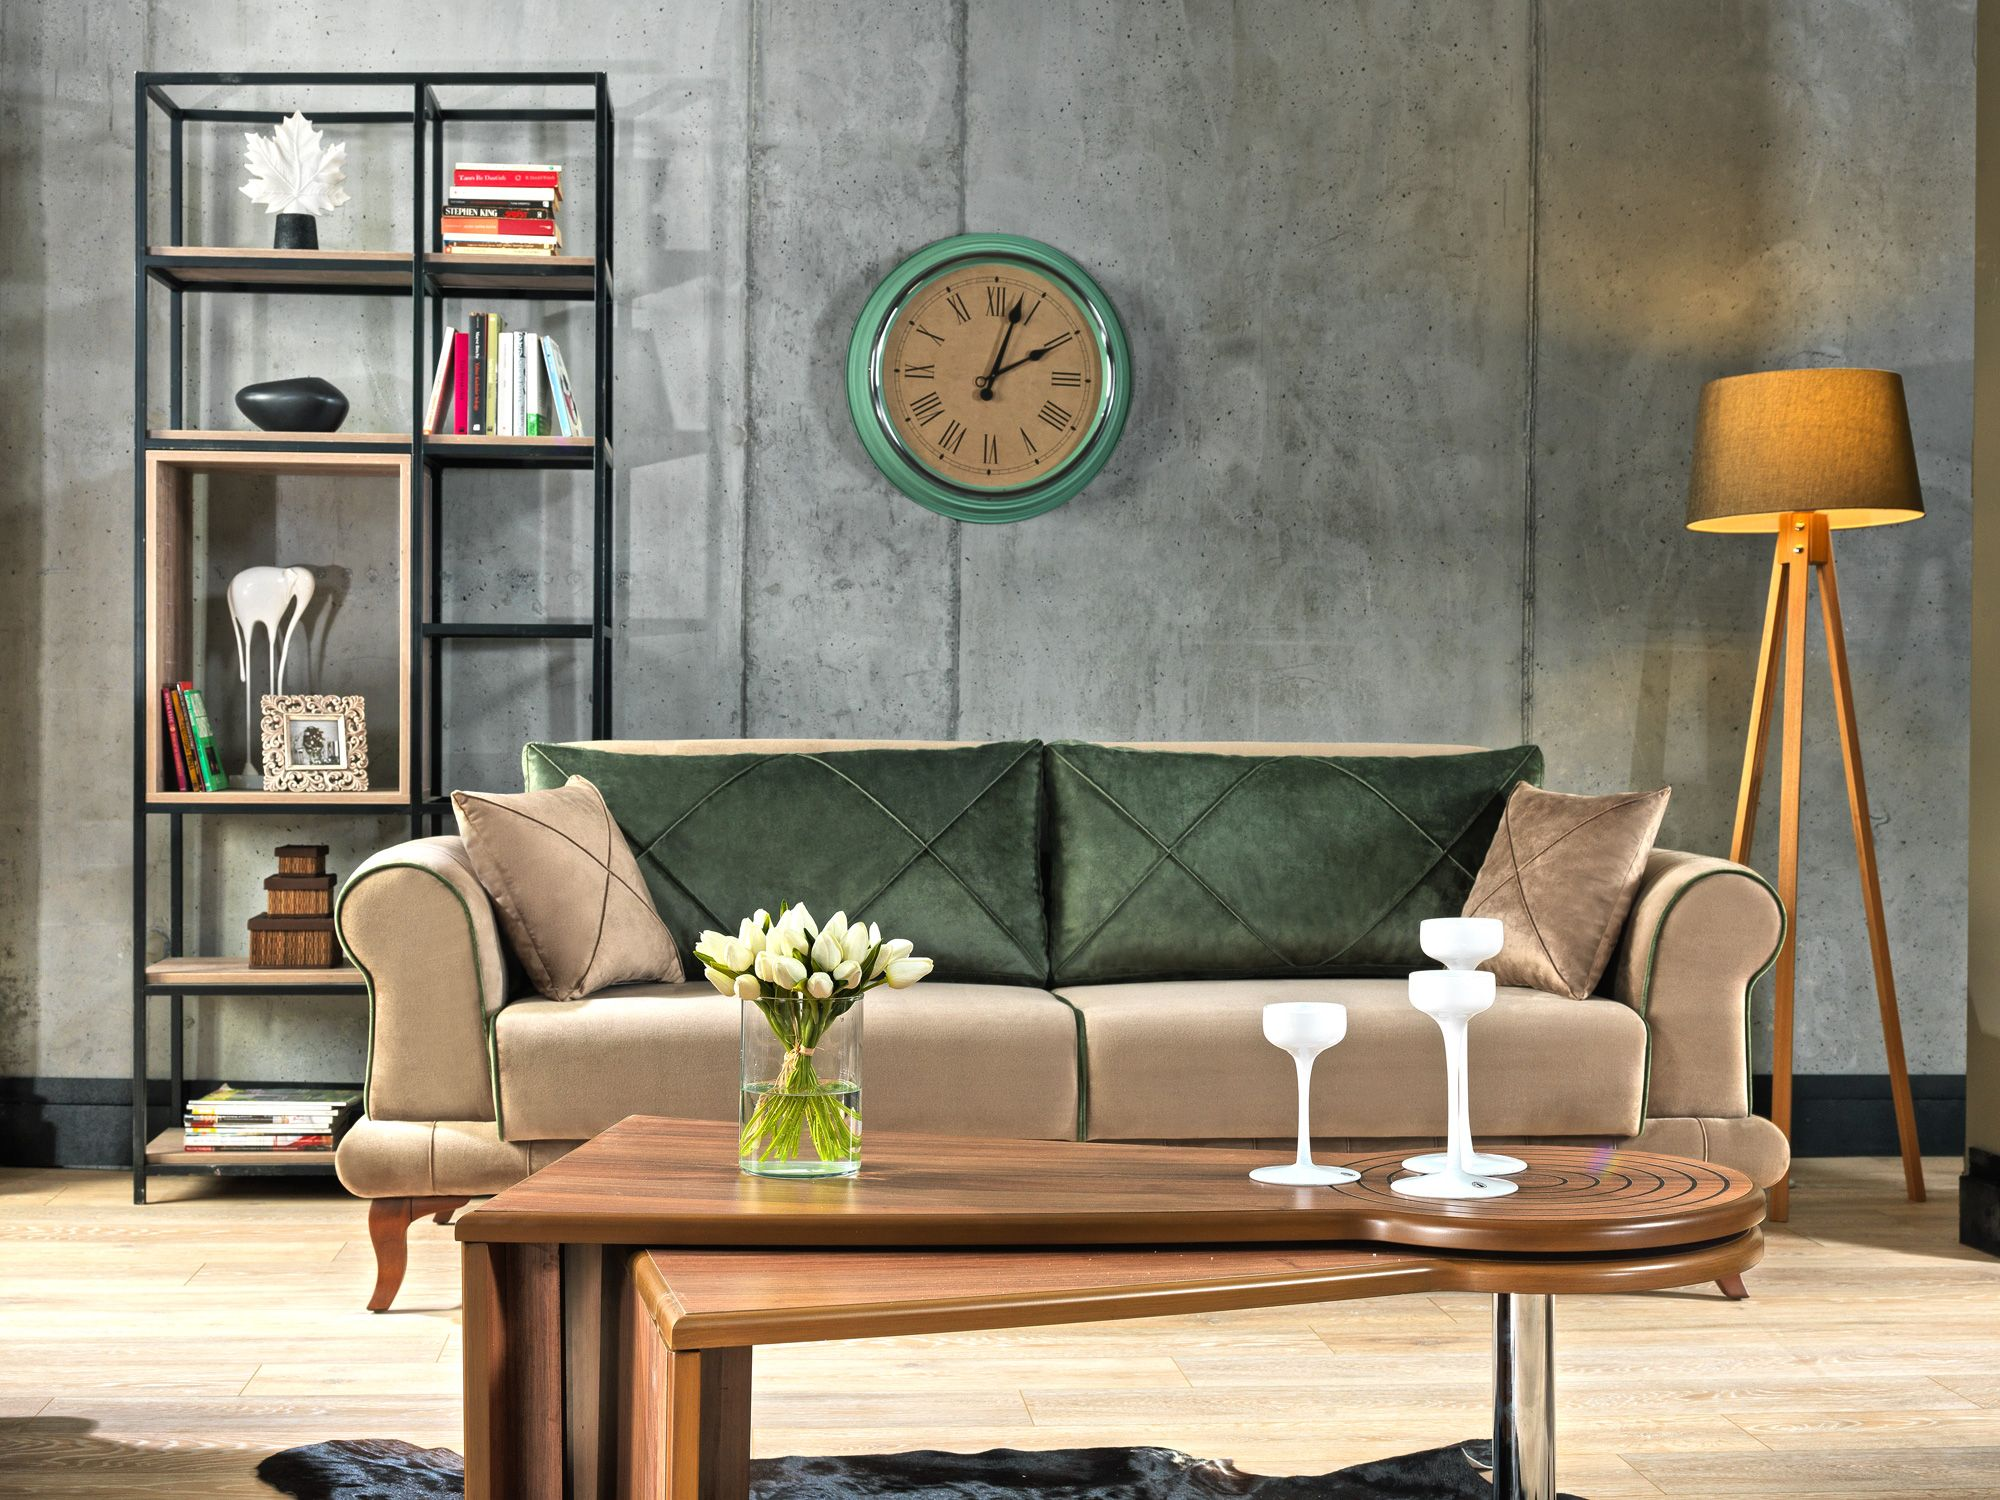 avensis koltuk takımı   decorall mobilya silivri İstanbul   koltuk, Innenarchitektur ideen